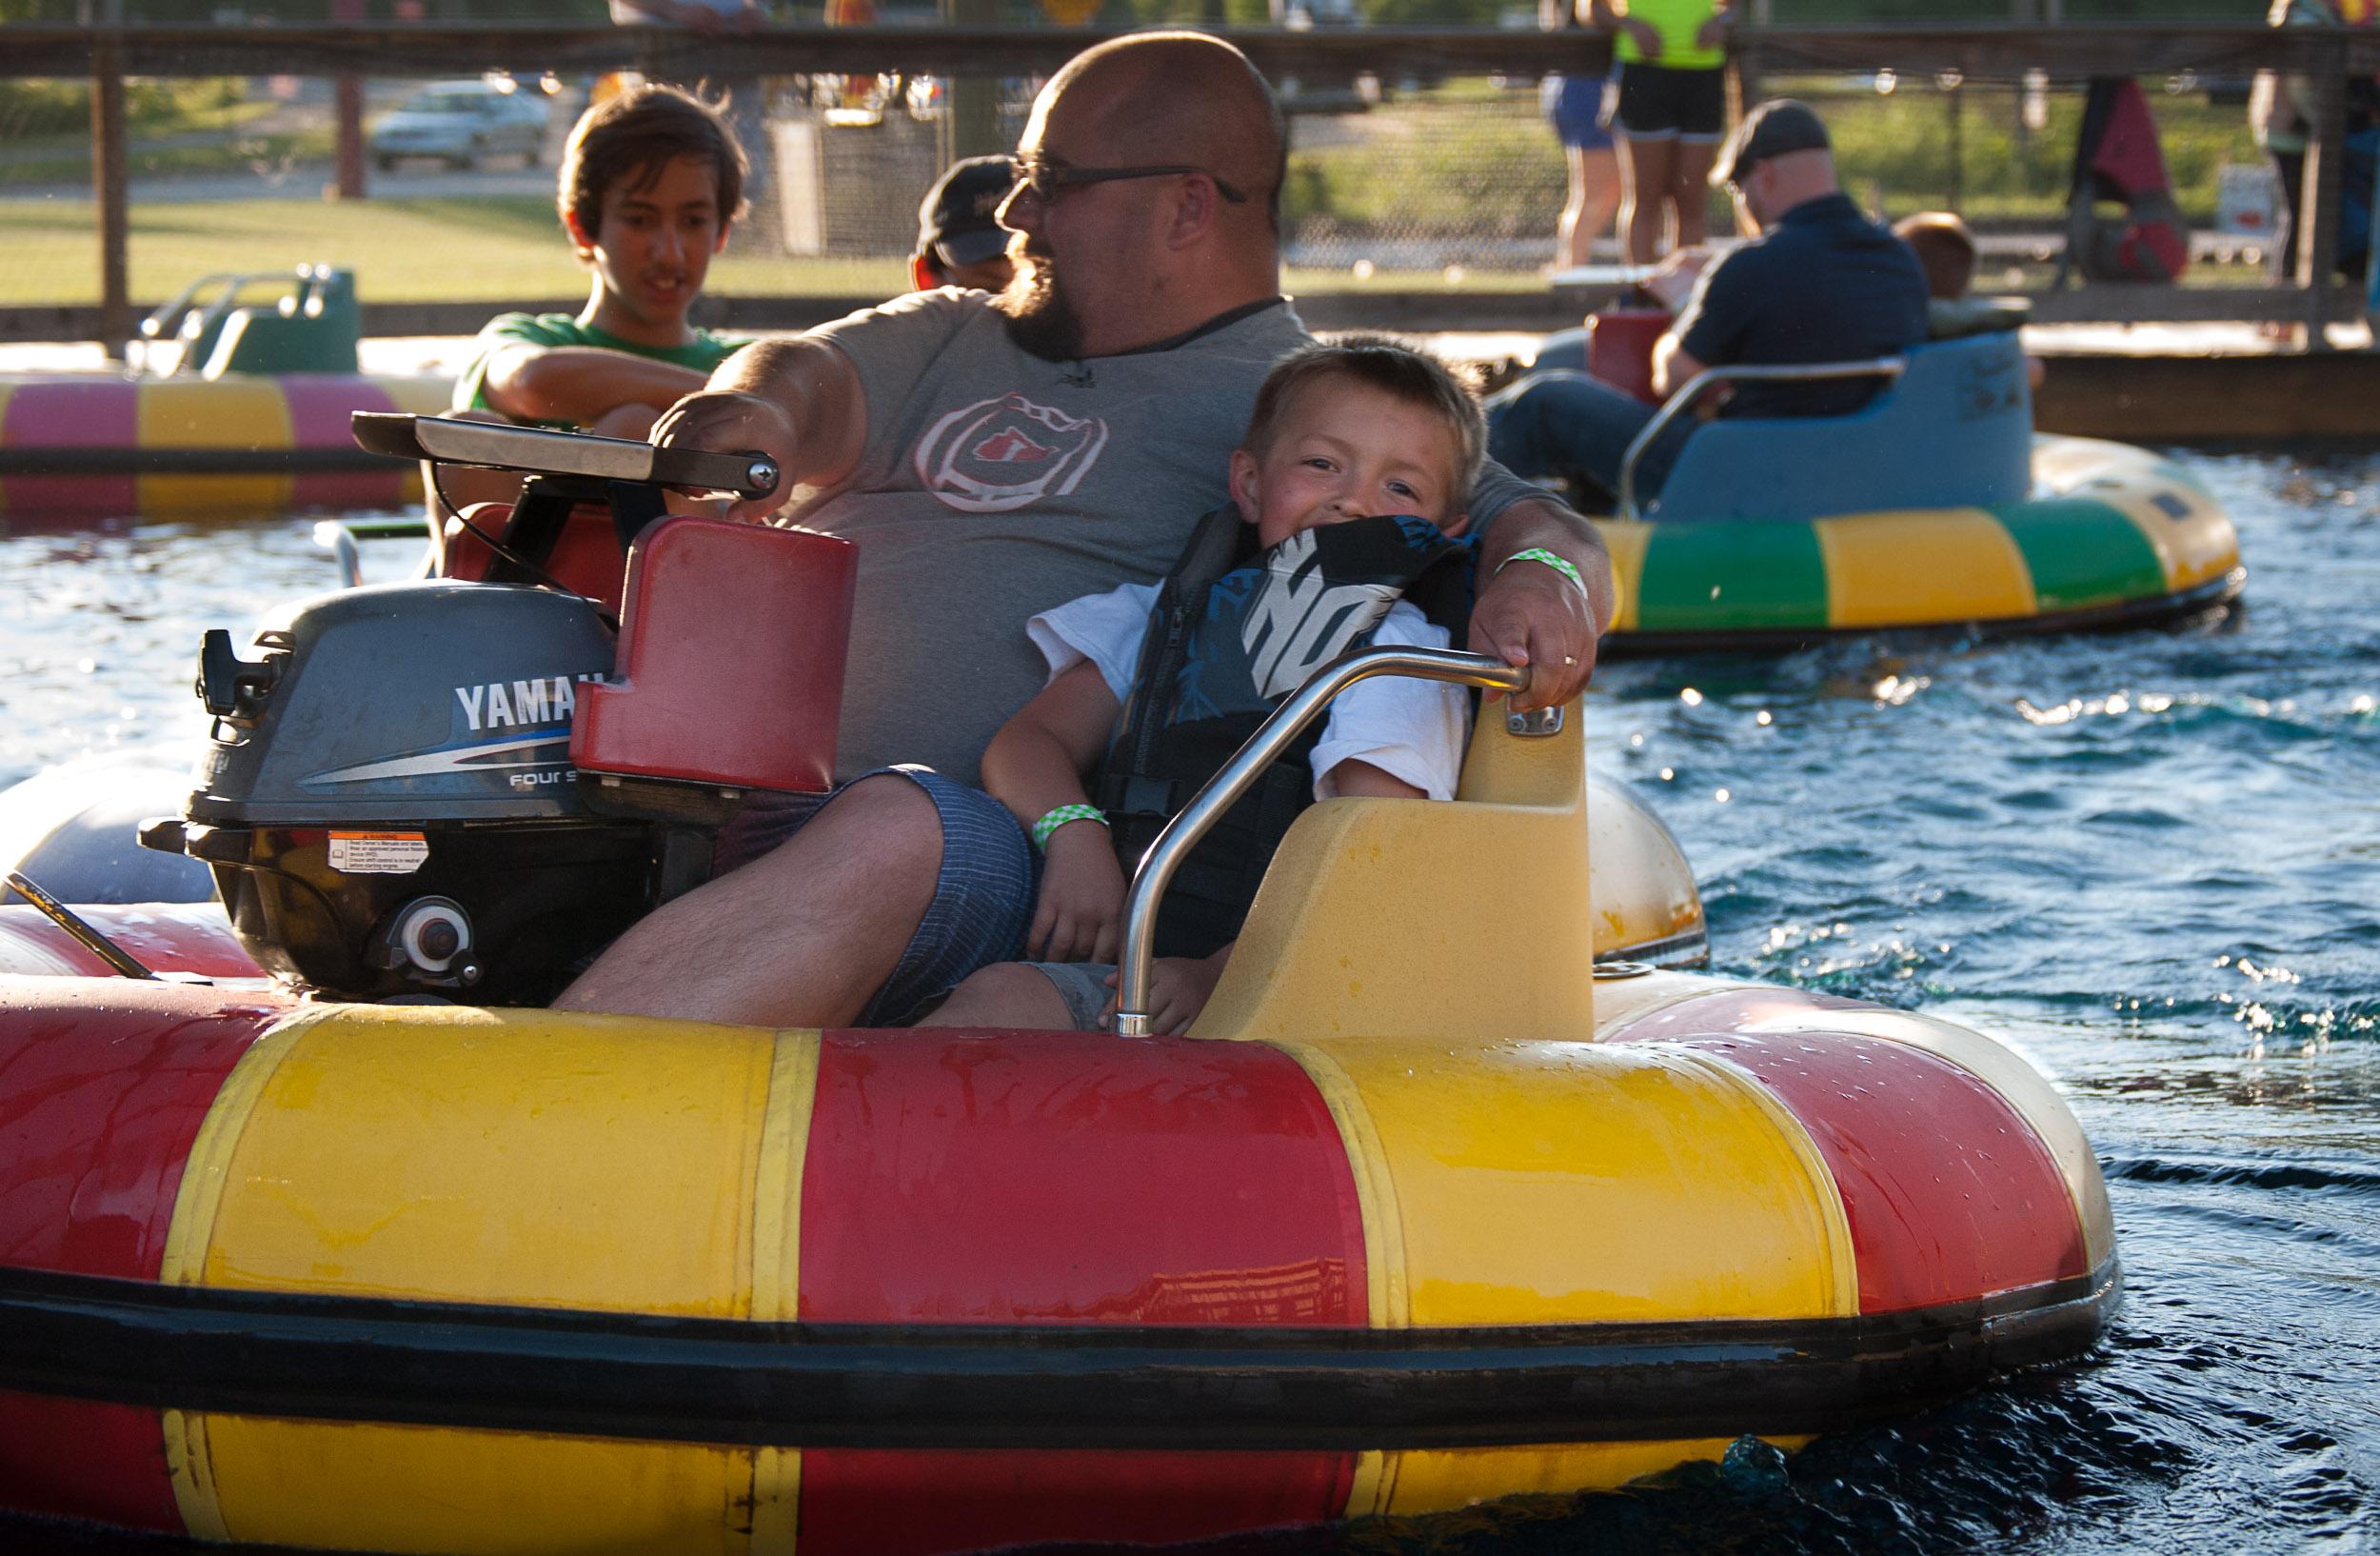 AJ's Family Fun Center | Comstock Park, MI